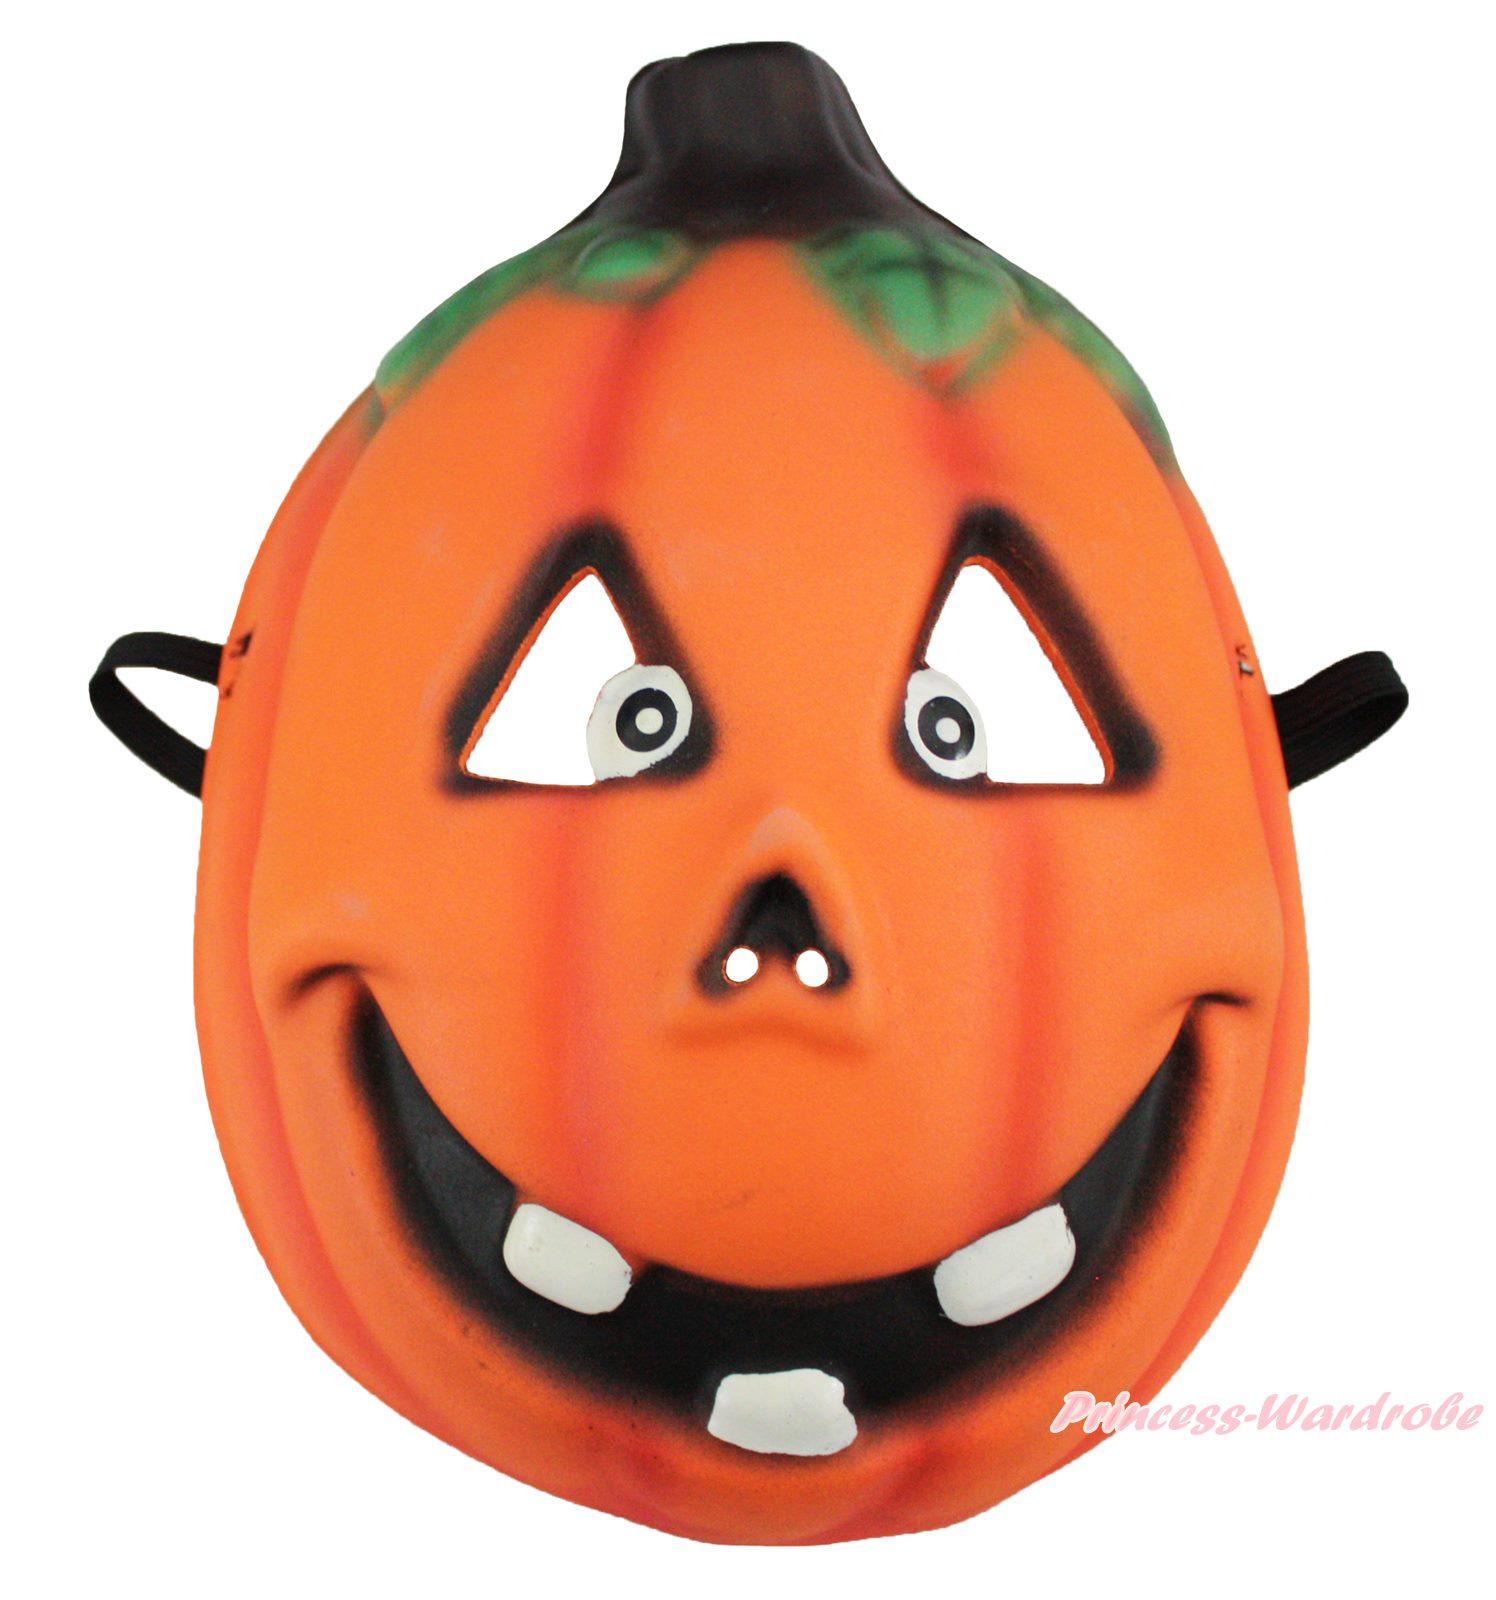 pink long ears rabbit face mask halloween costume c389